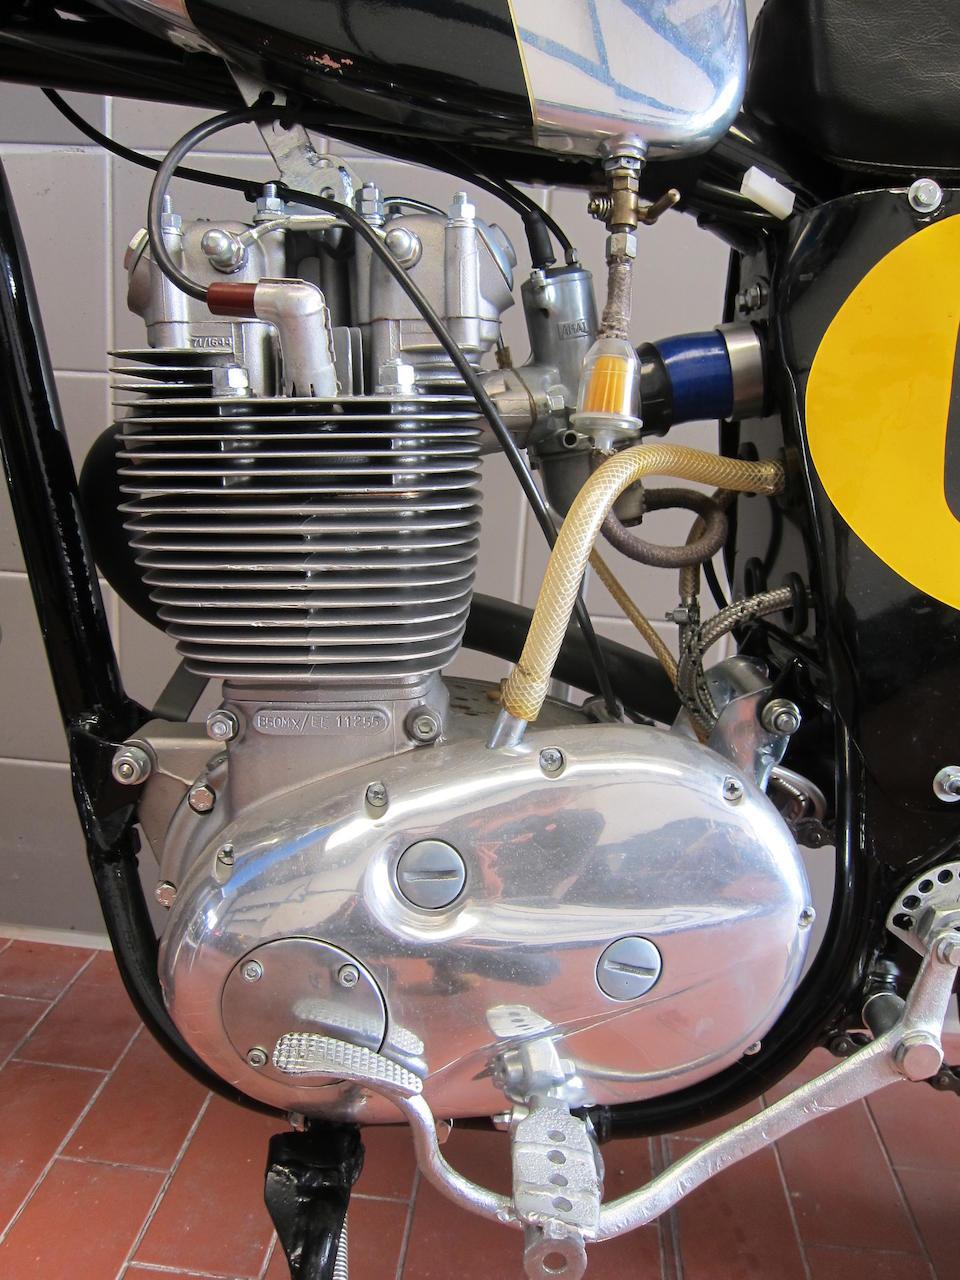 c.1971  BSA 500cc B50 MX Frame no. B50MXEE11255 Engine no. B50MX/EE 11255